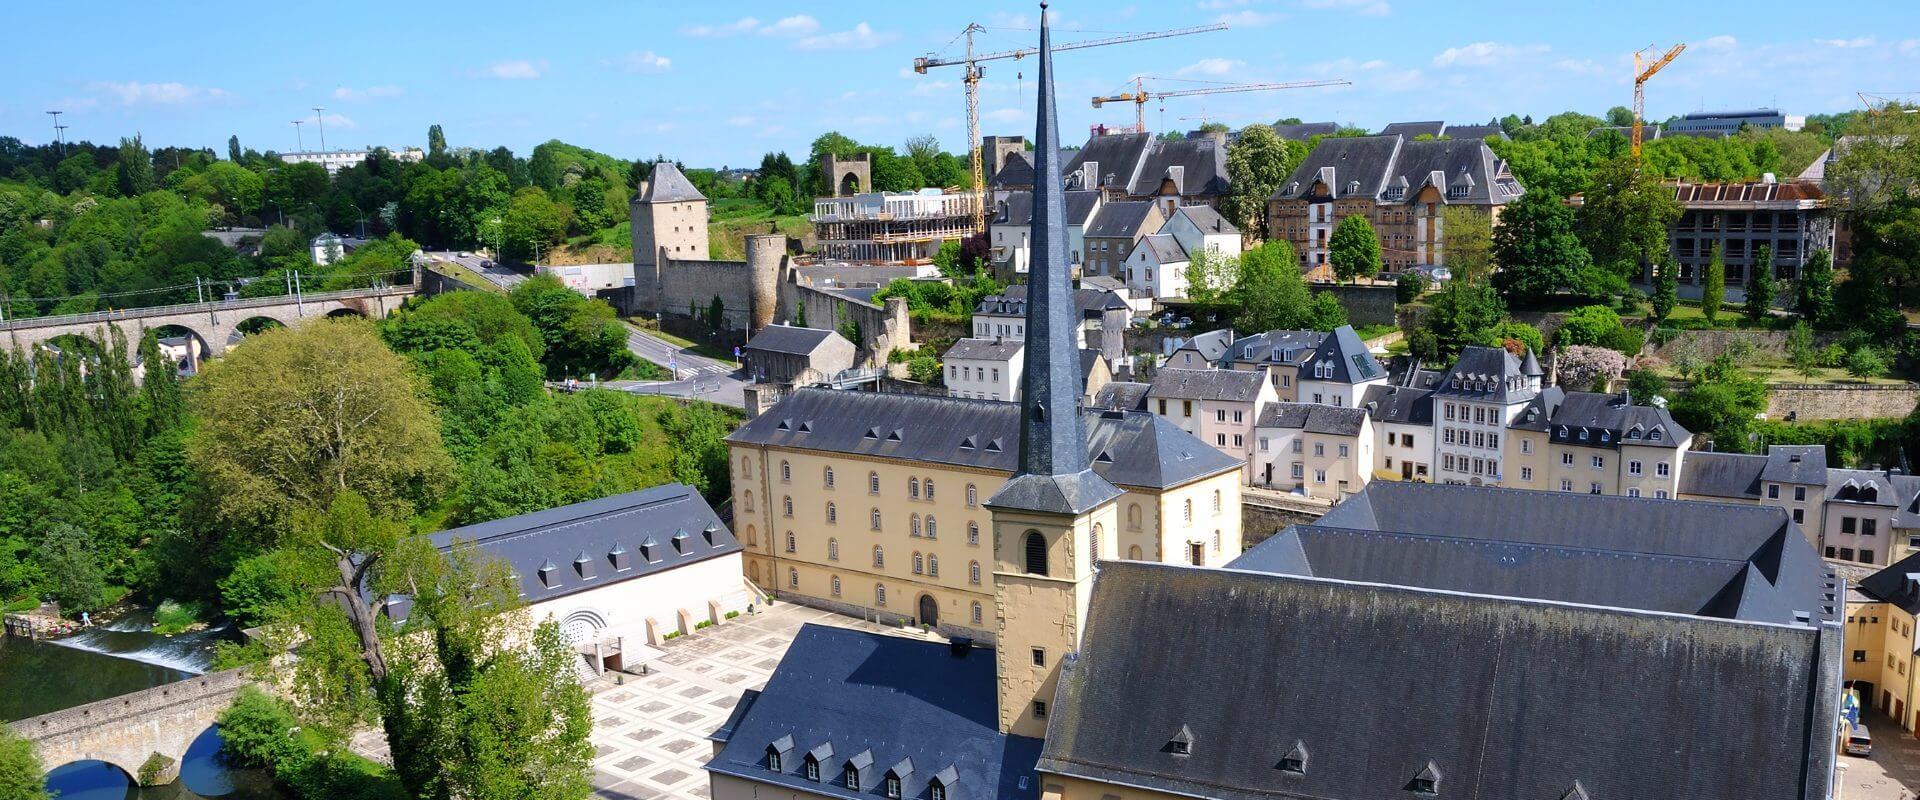 Bild Luxemburg Stadt